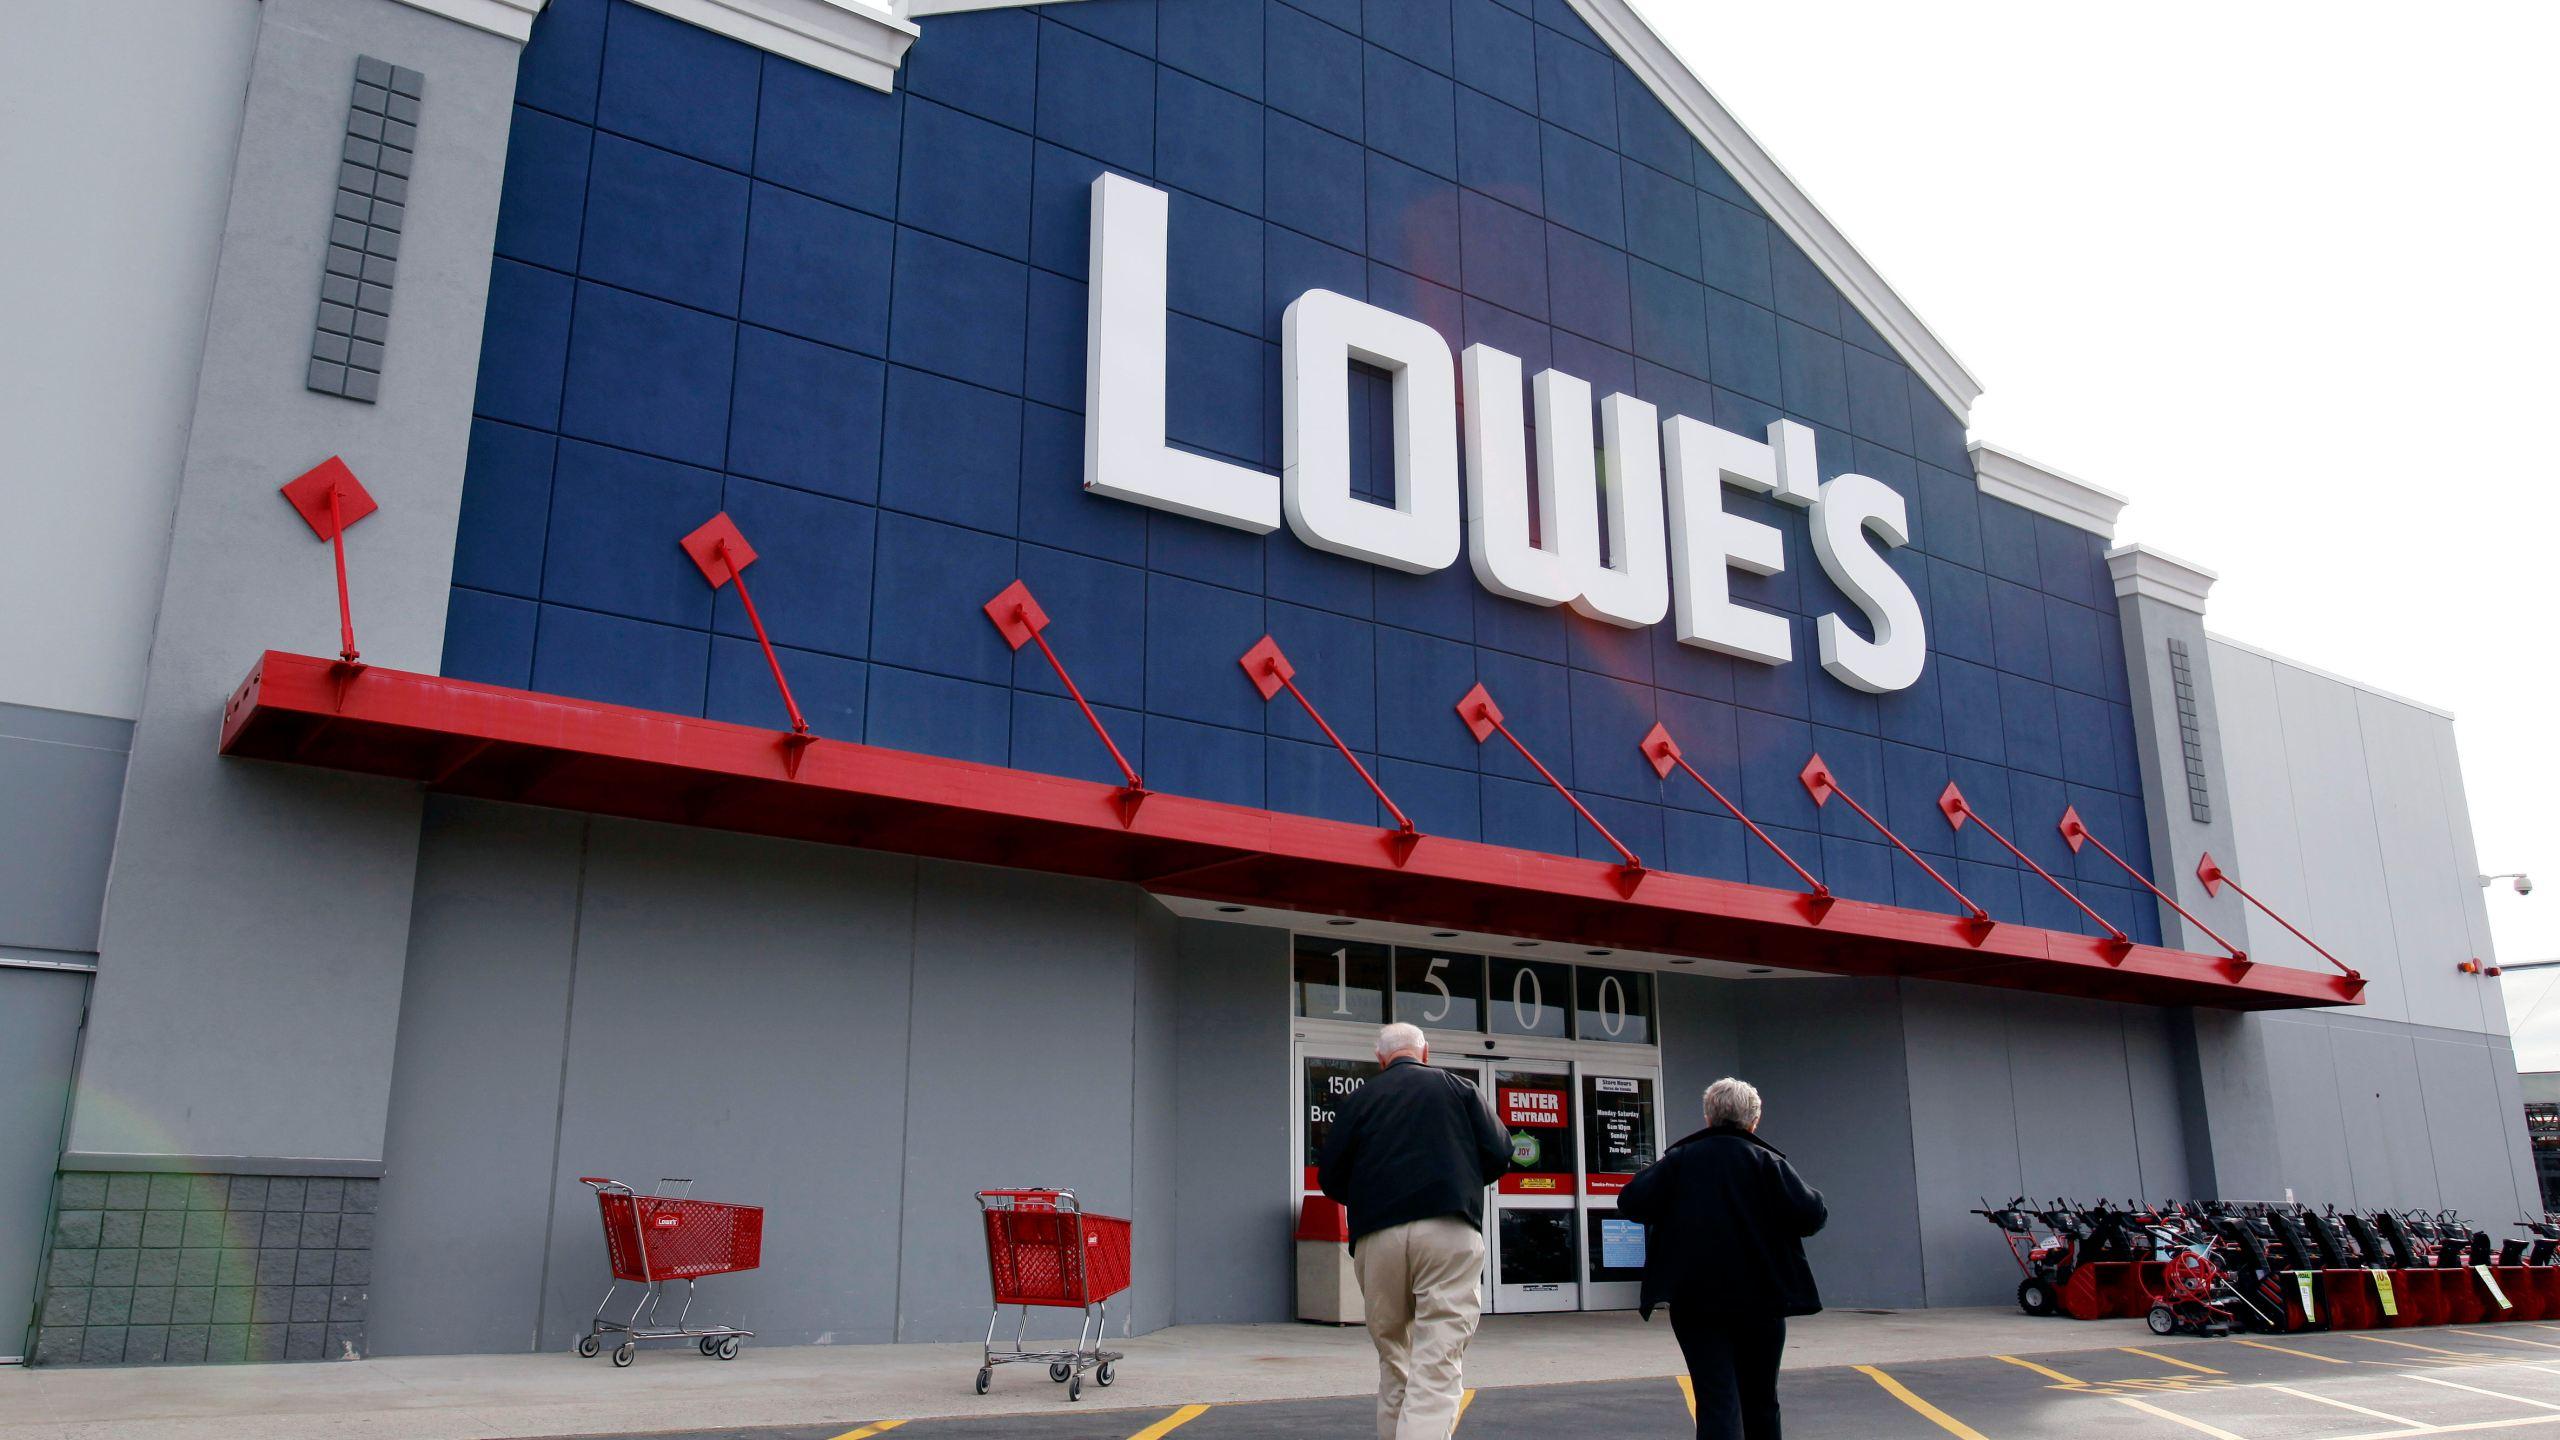 Lowe S Is Giving Away 55 Million In Small Business Grants Klbk Kamc Everythinglubbock Com